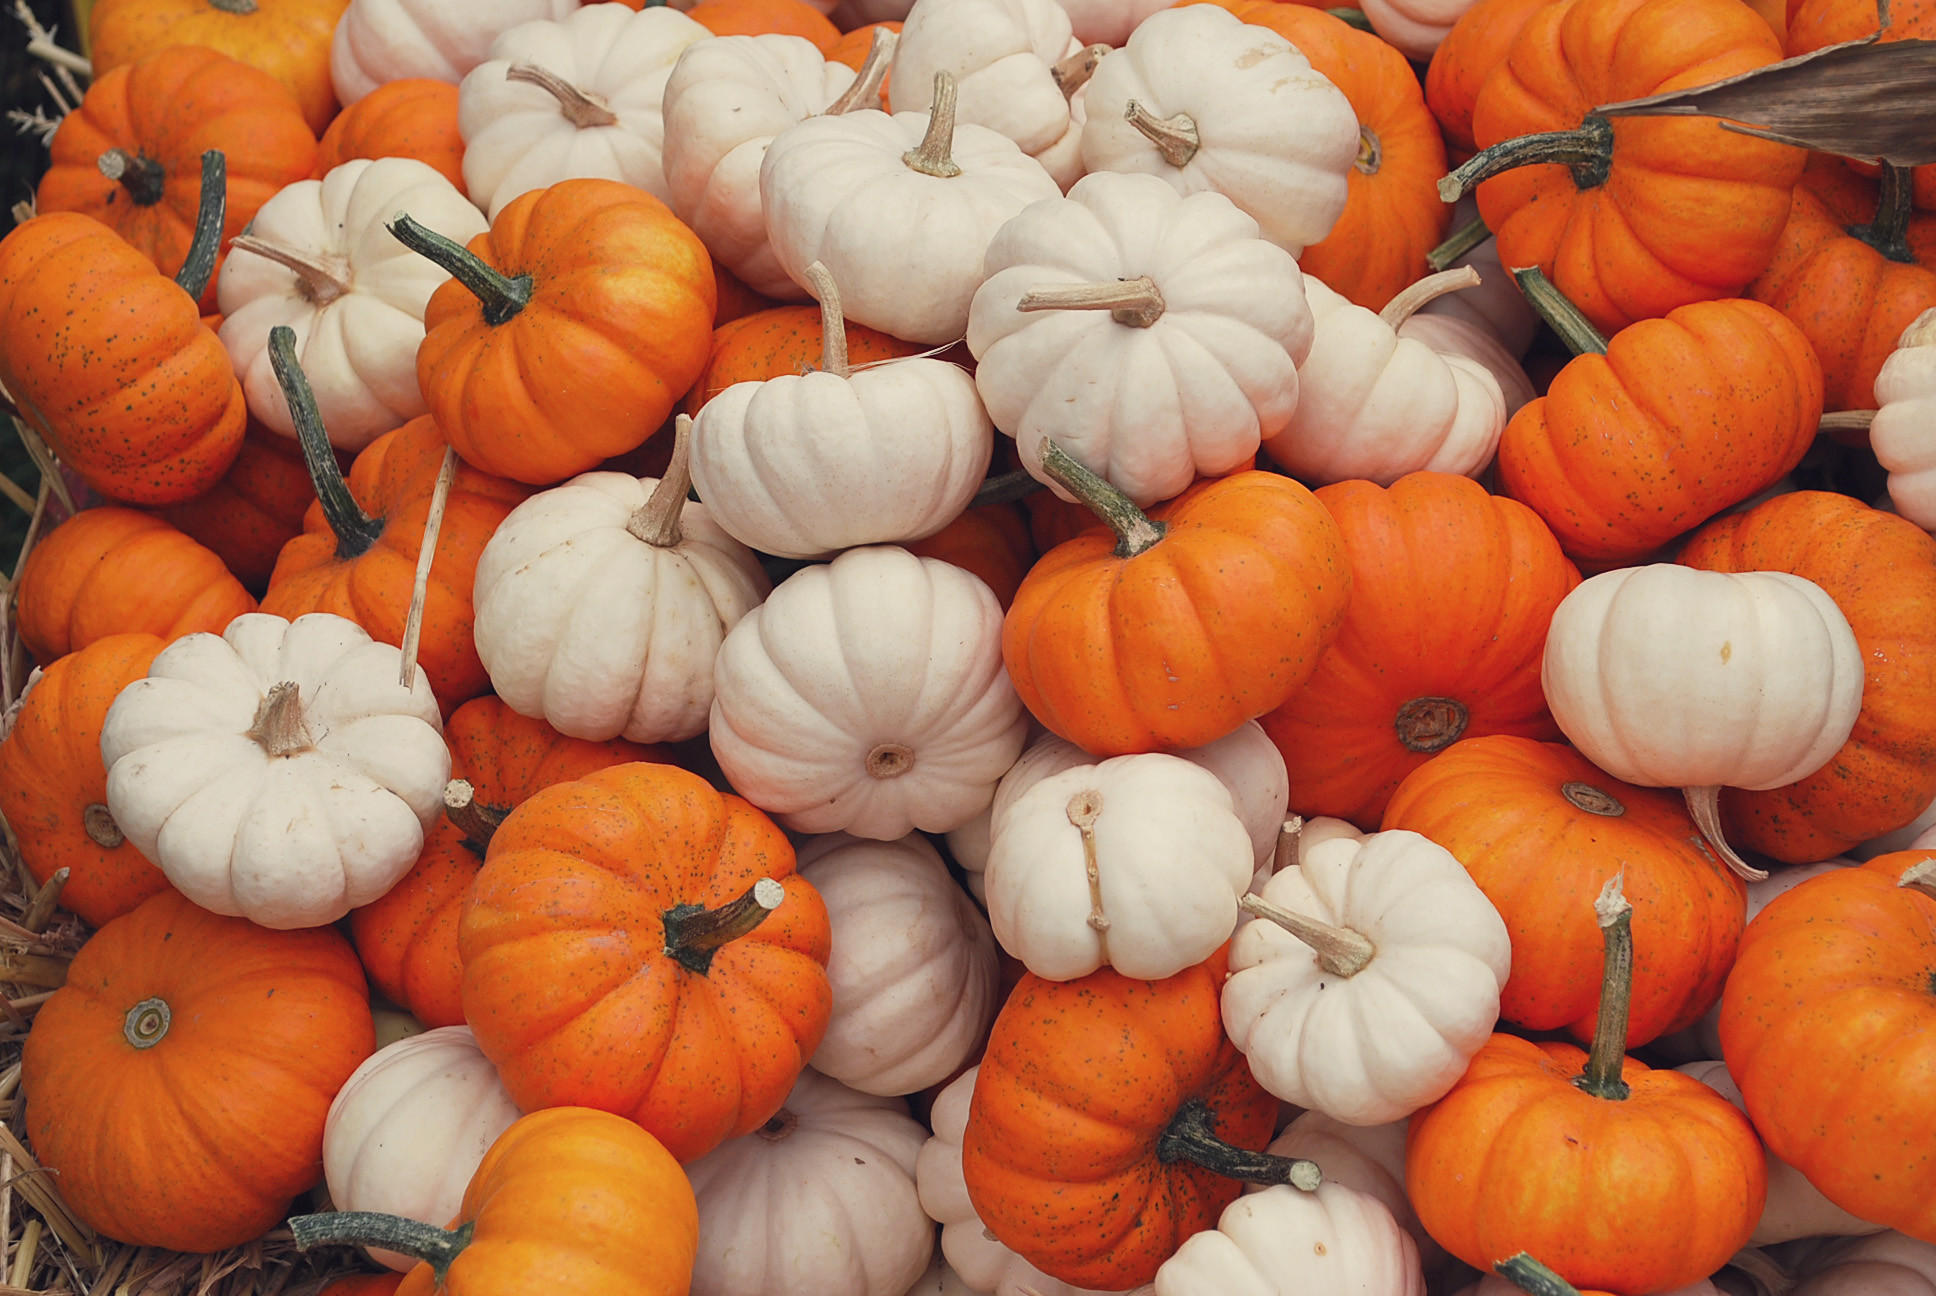 Fall scene wallpaper with pumpkins 52 images - Fall wallpaper pumpkins ...